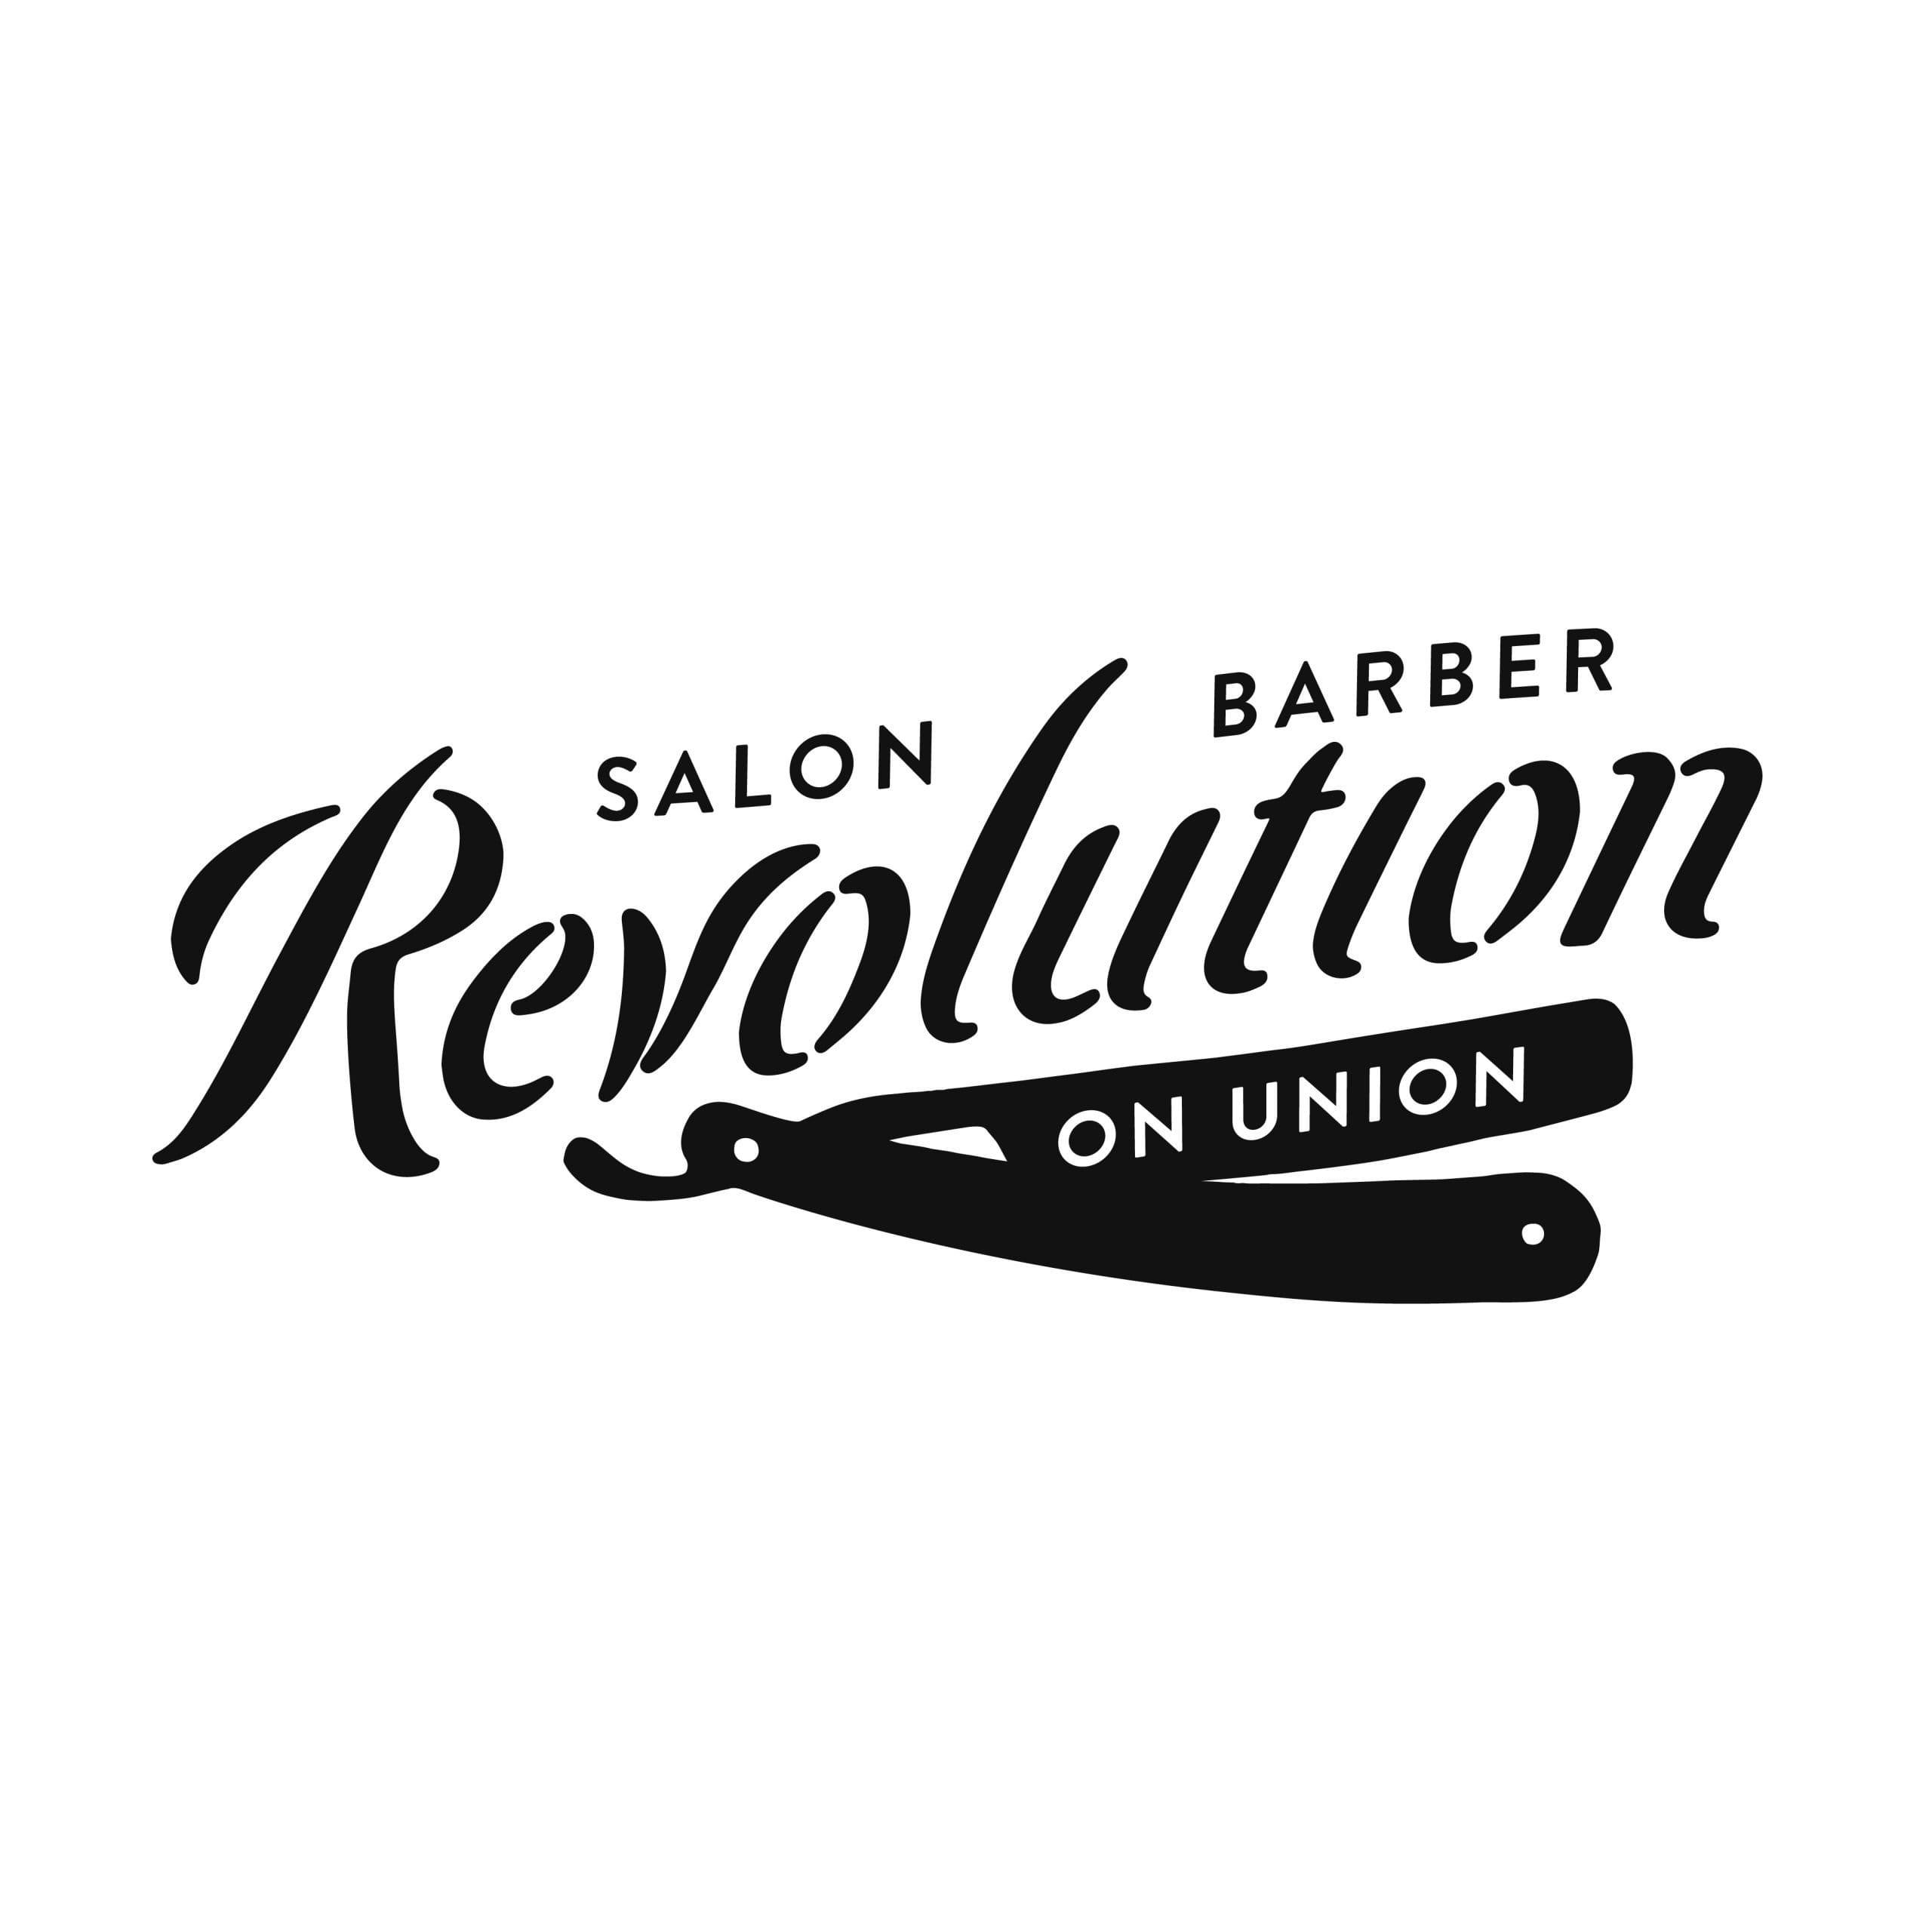 Revolution on Union Logo Design